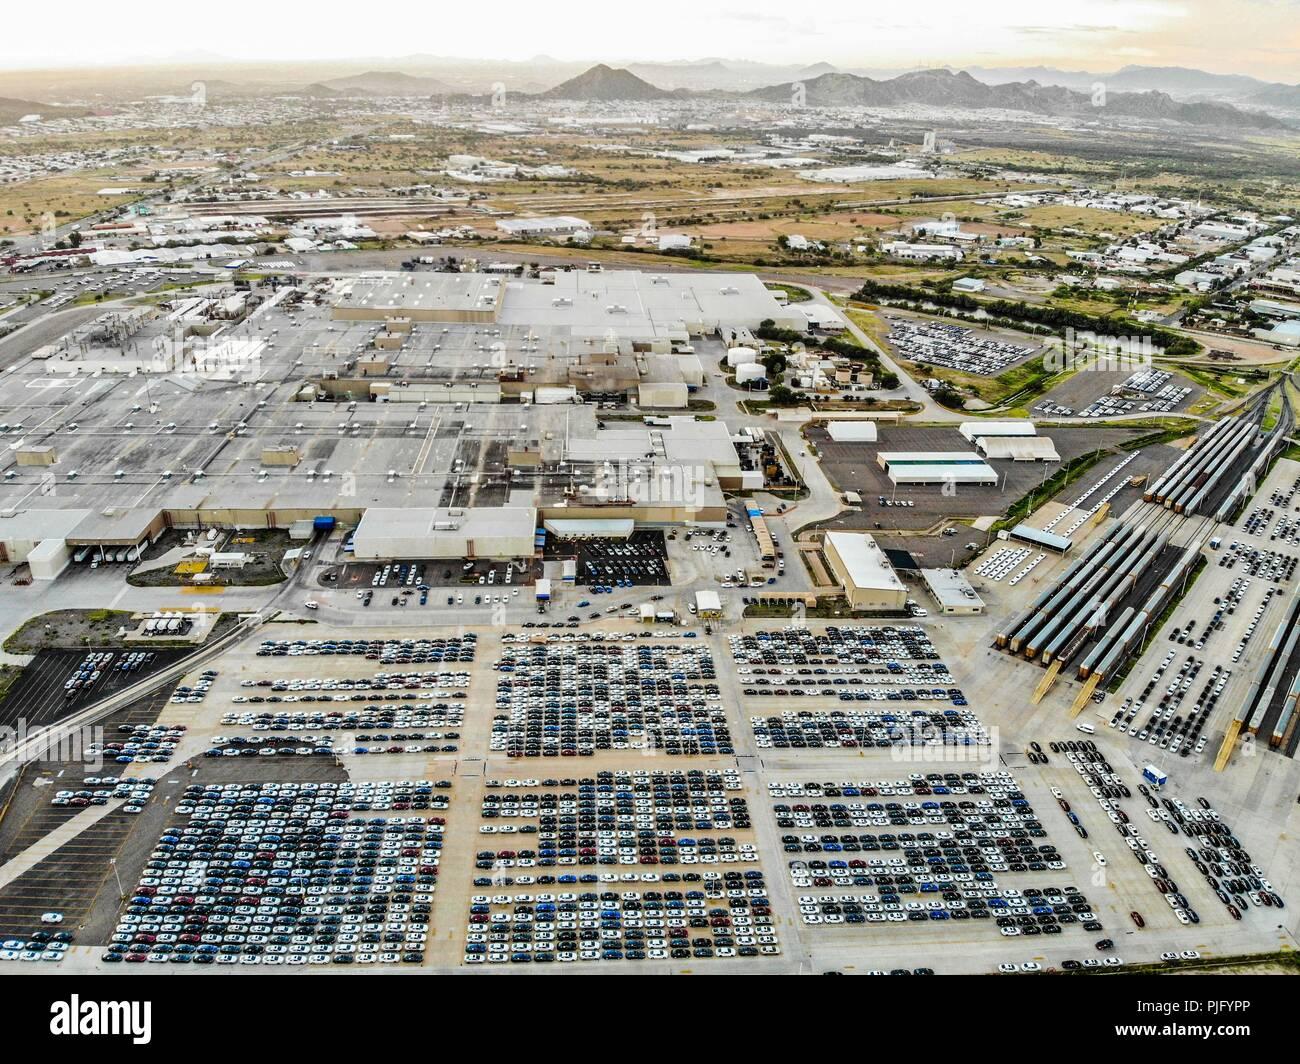 Luftaufnahme von der Ford Motor Company Automotive Company in Hermosillo, Sonora Mexico. Hunderte von neuen Autos.. Trasnport. Auto Stockbild